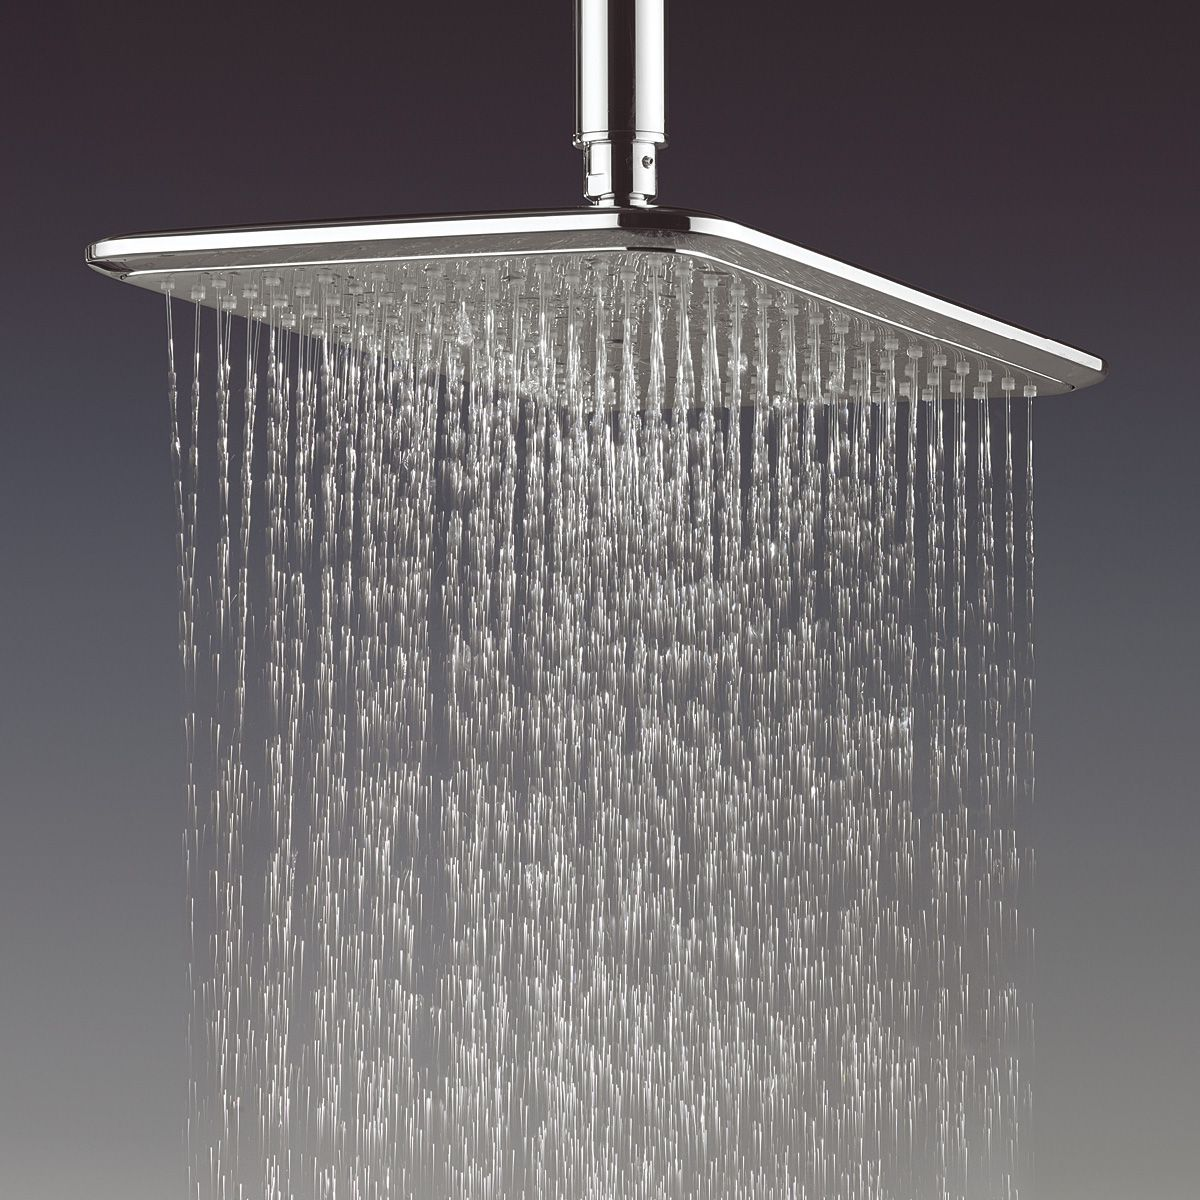 Crosswater essence fixed rectangular shower head : UK Bathrooms